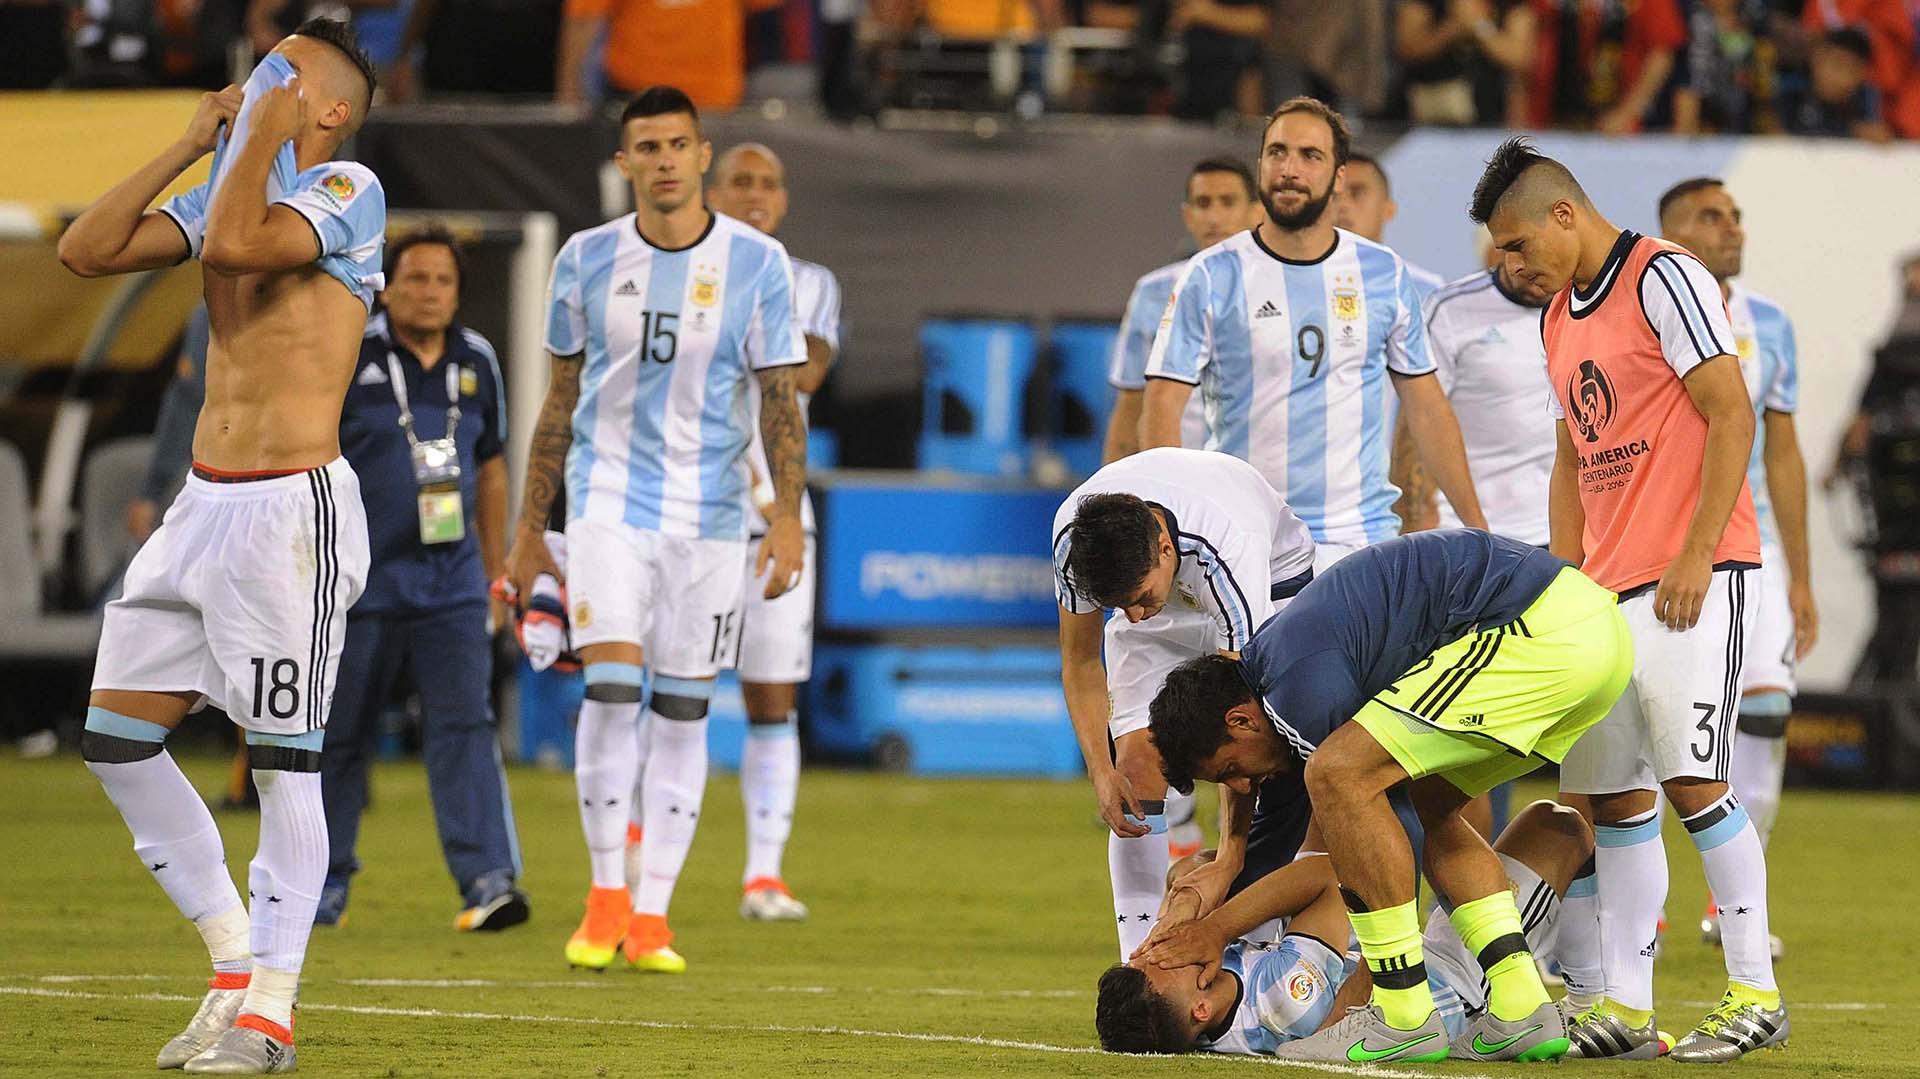 40 imágenes de la triste derrota ante Chile - Infobae